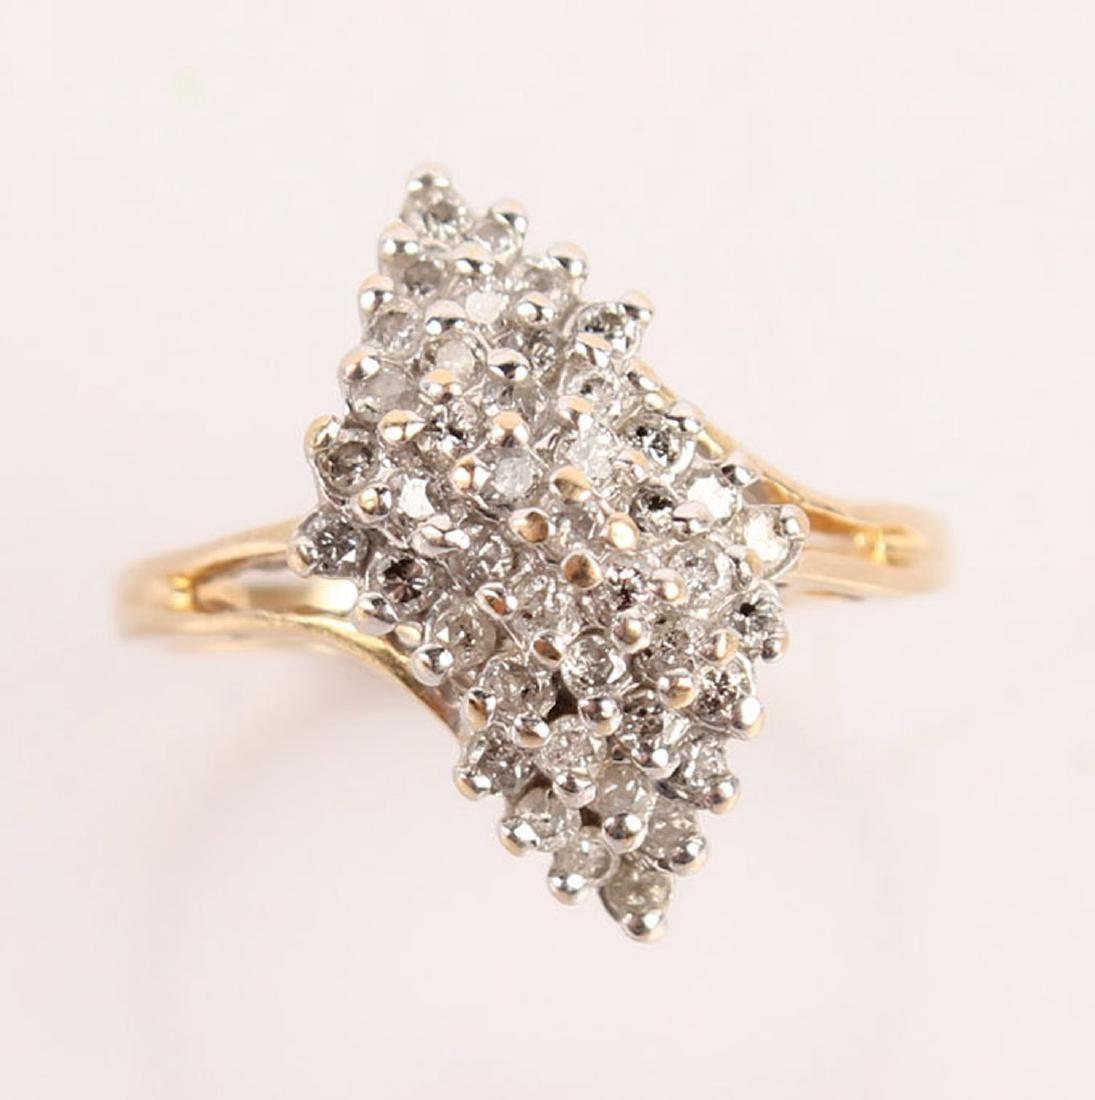 LADIES 14K YELLOW GOLD CLUSTER DIAMOND RING